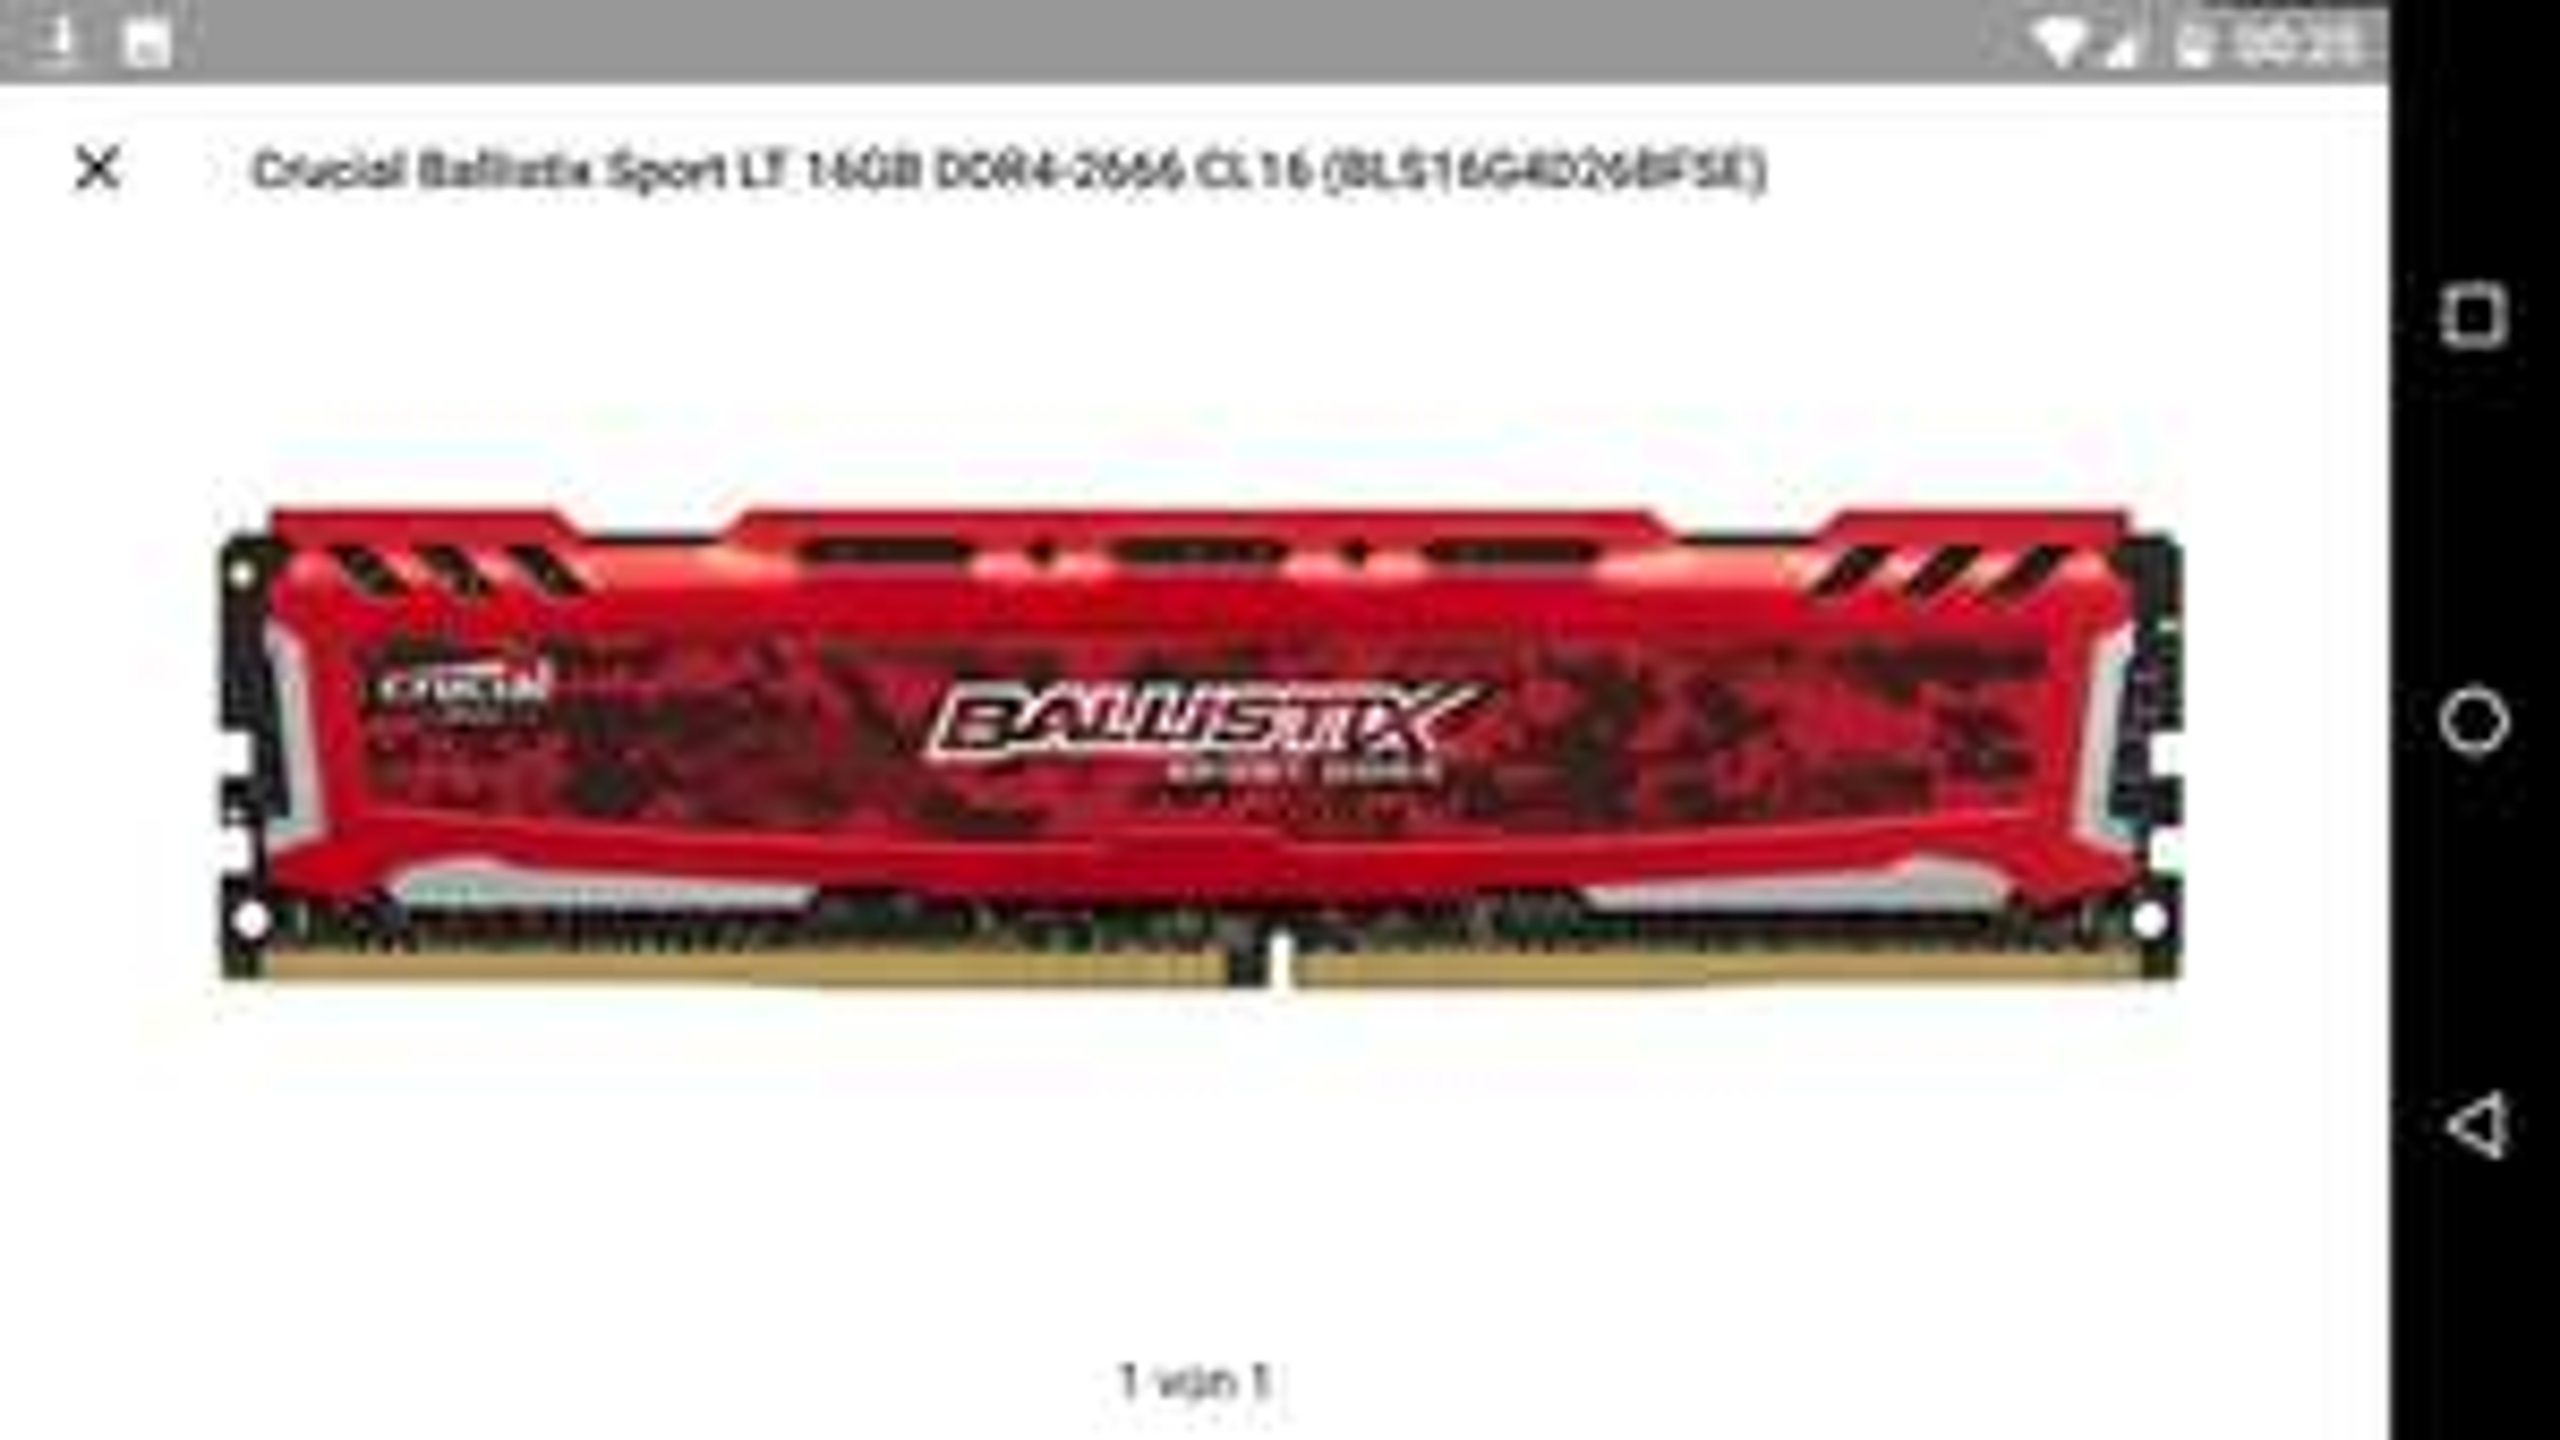 [NBB] Crucial Ballistix Sport LT 1x16GB DDR4-2666 CL16 (BLS16G4D26BFSE)